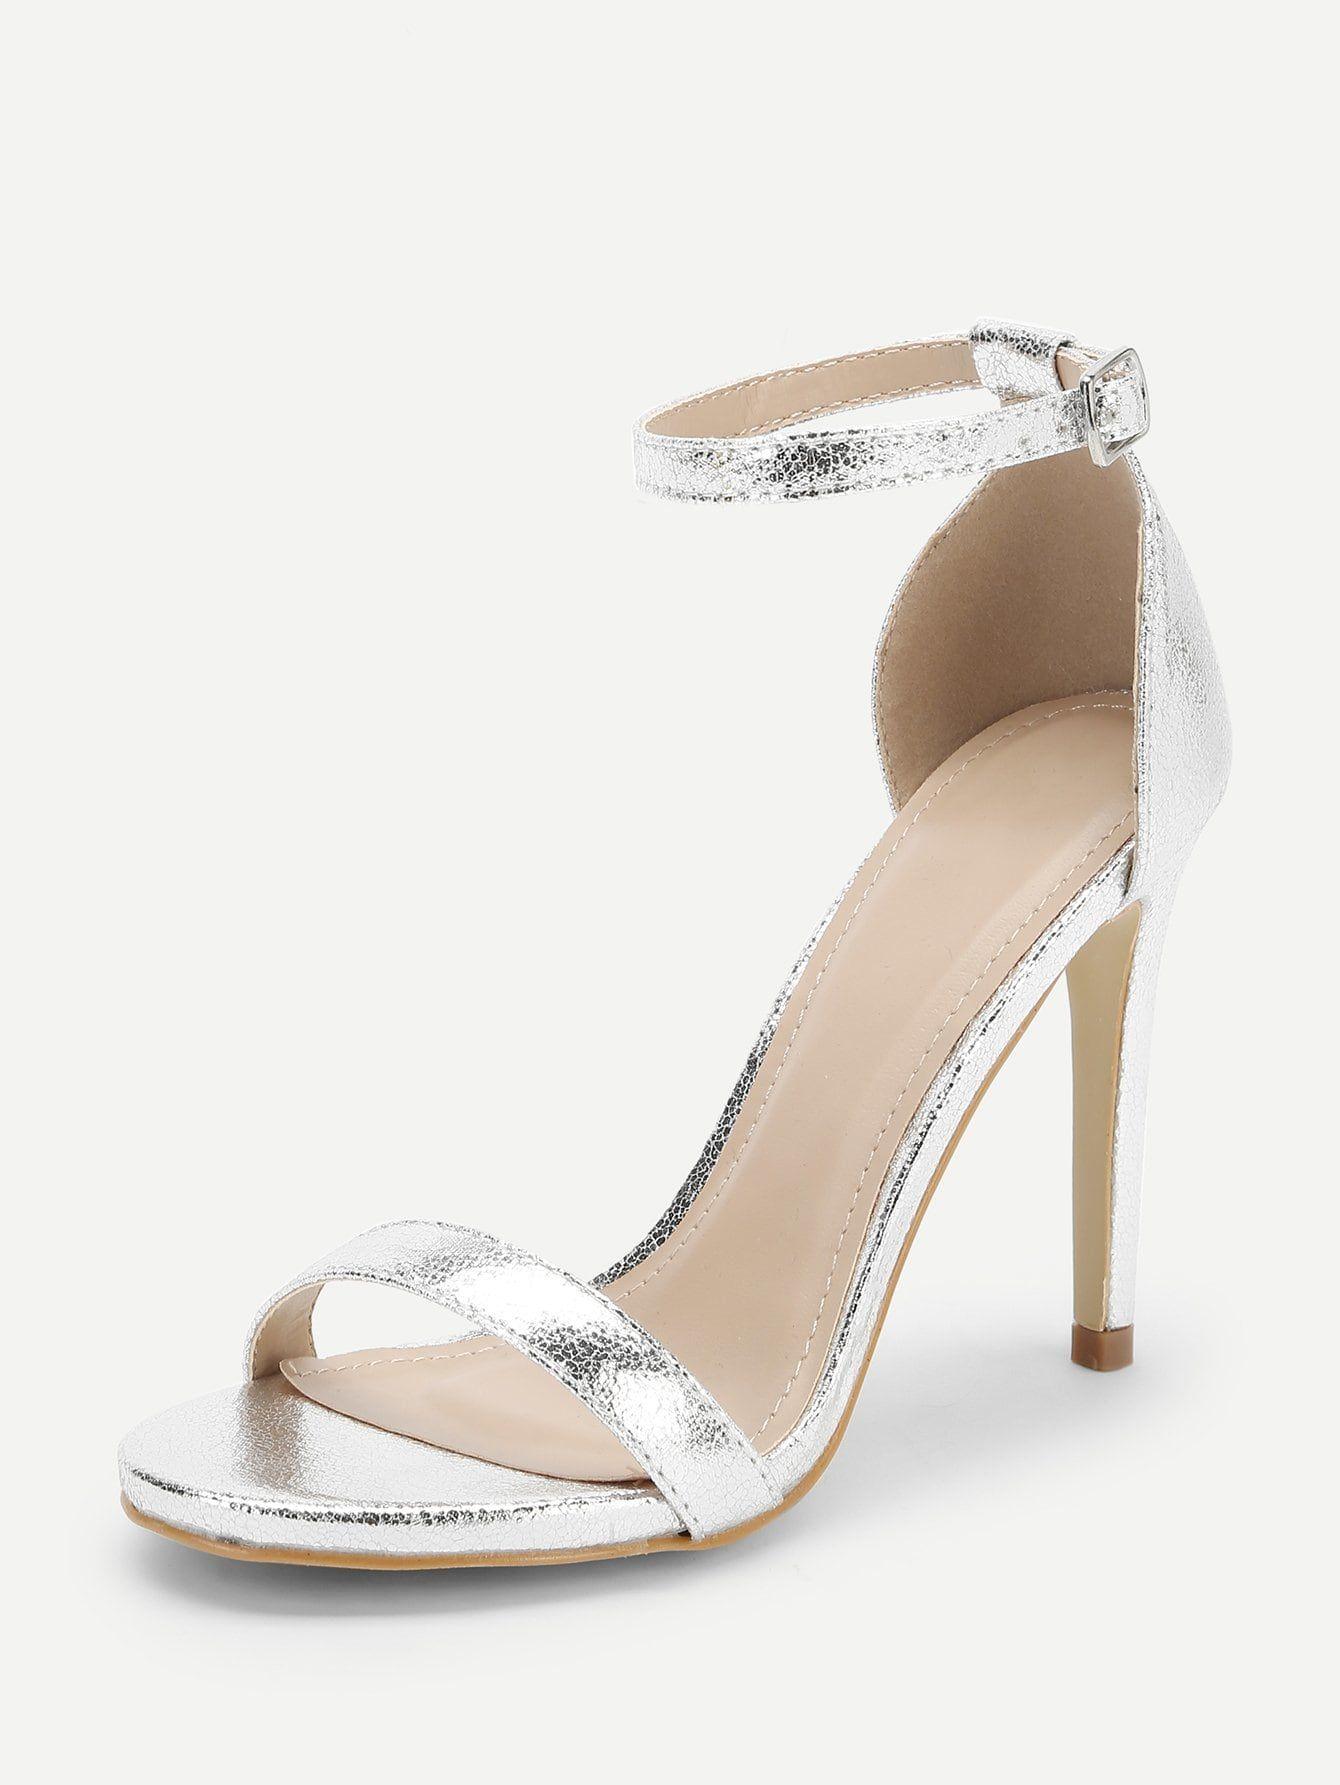 8dffe2d580c Glamorous Open Toe Plain Ankle strap Grey High Heel Stiletto Single ...